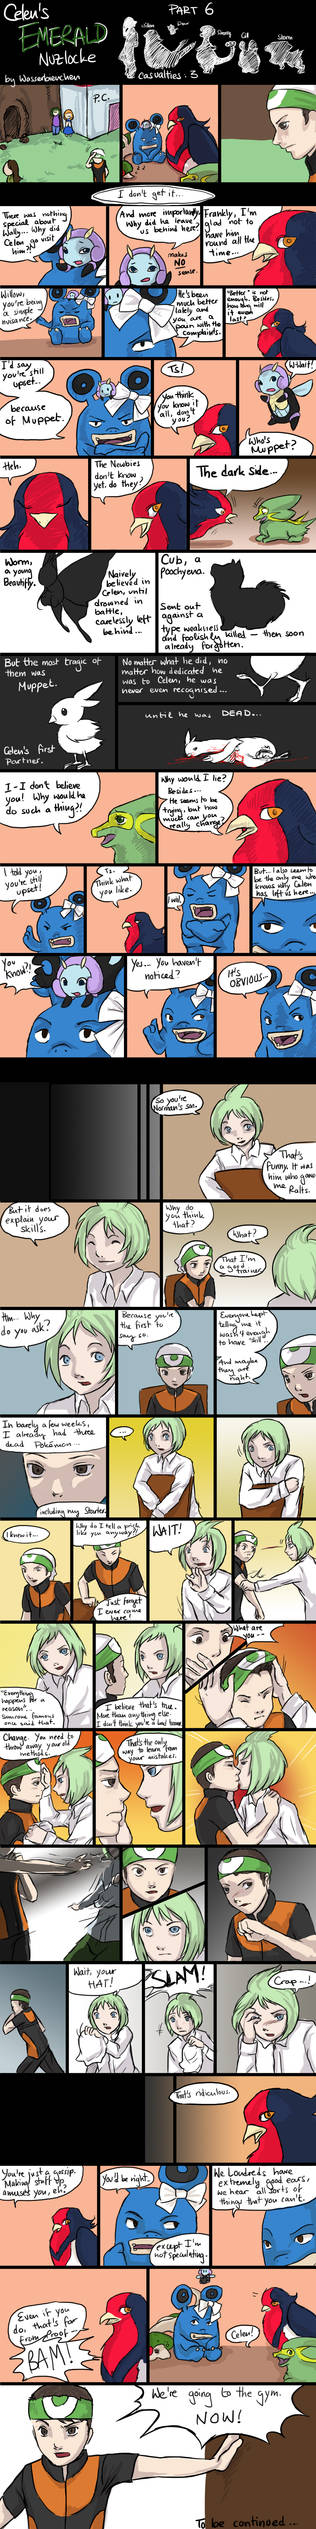 Celen's Nuzlocke: Part 6